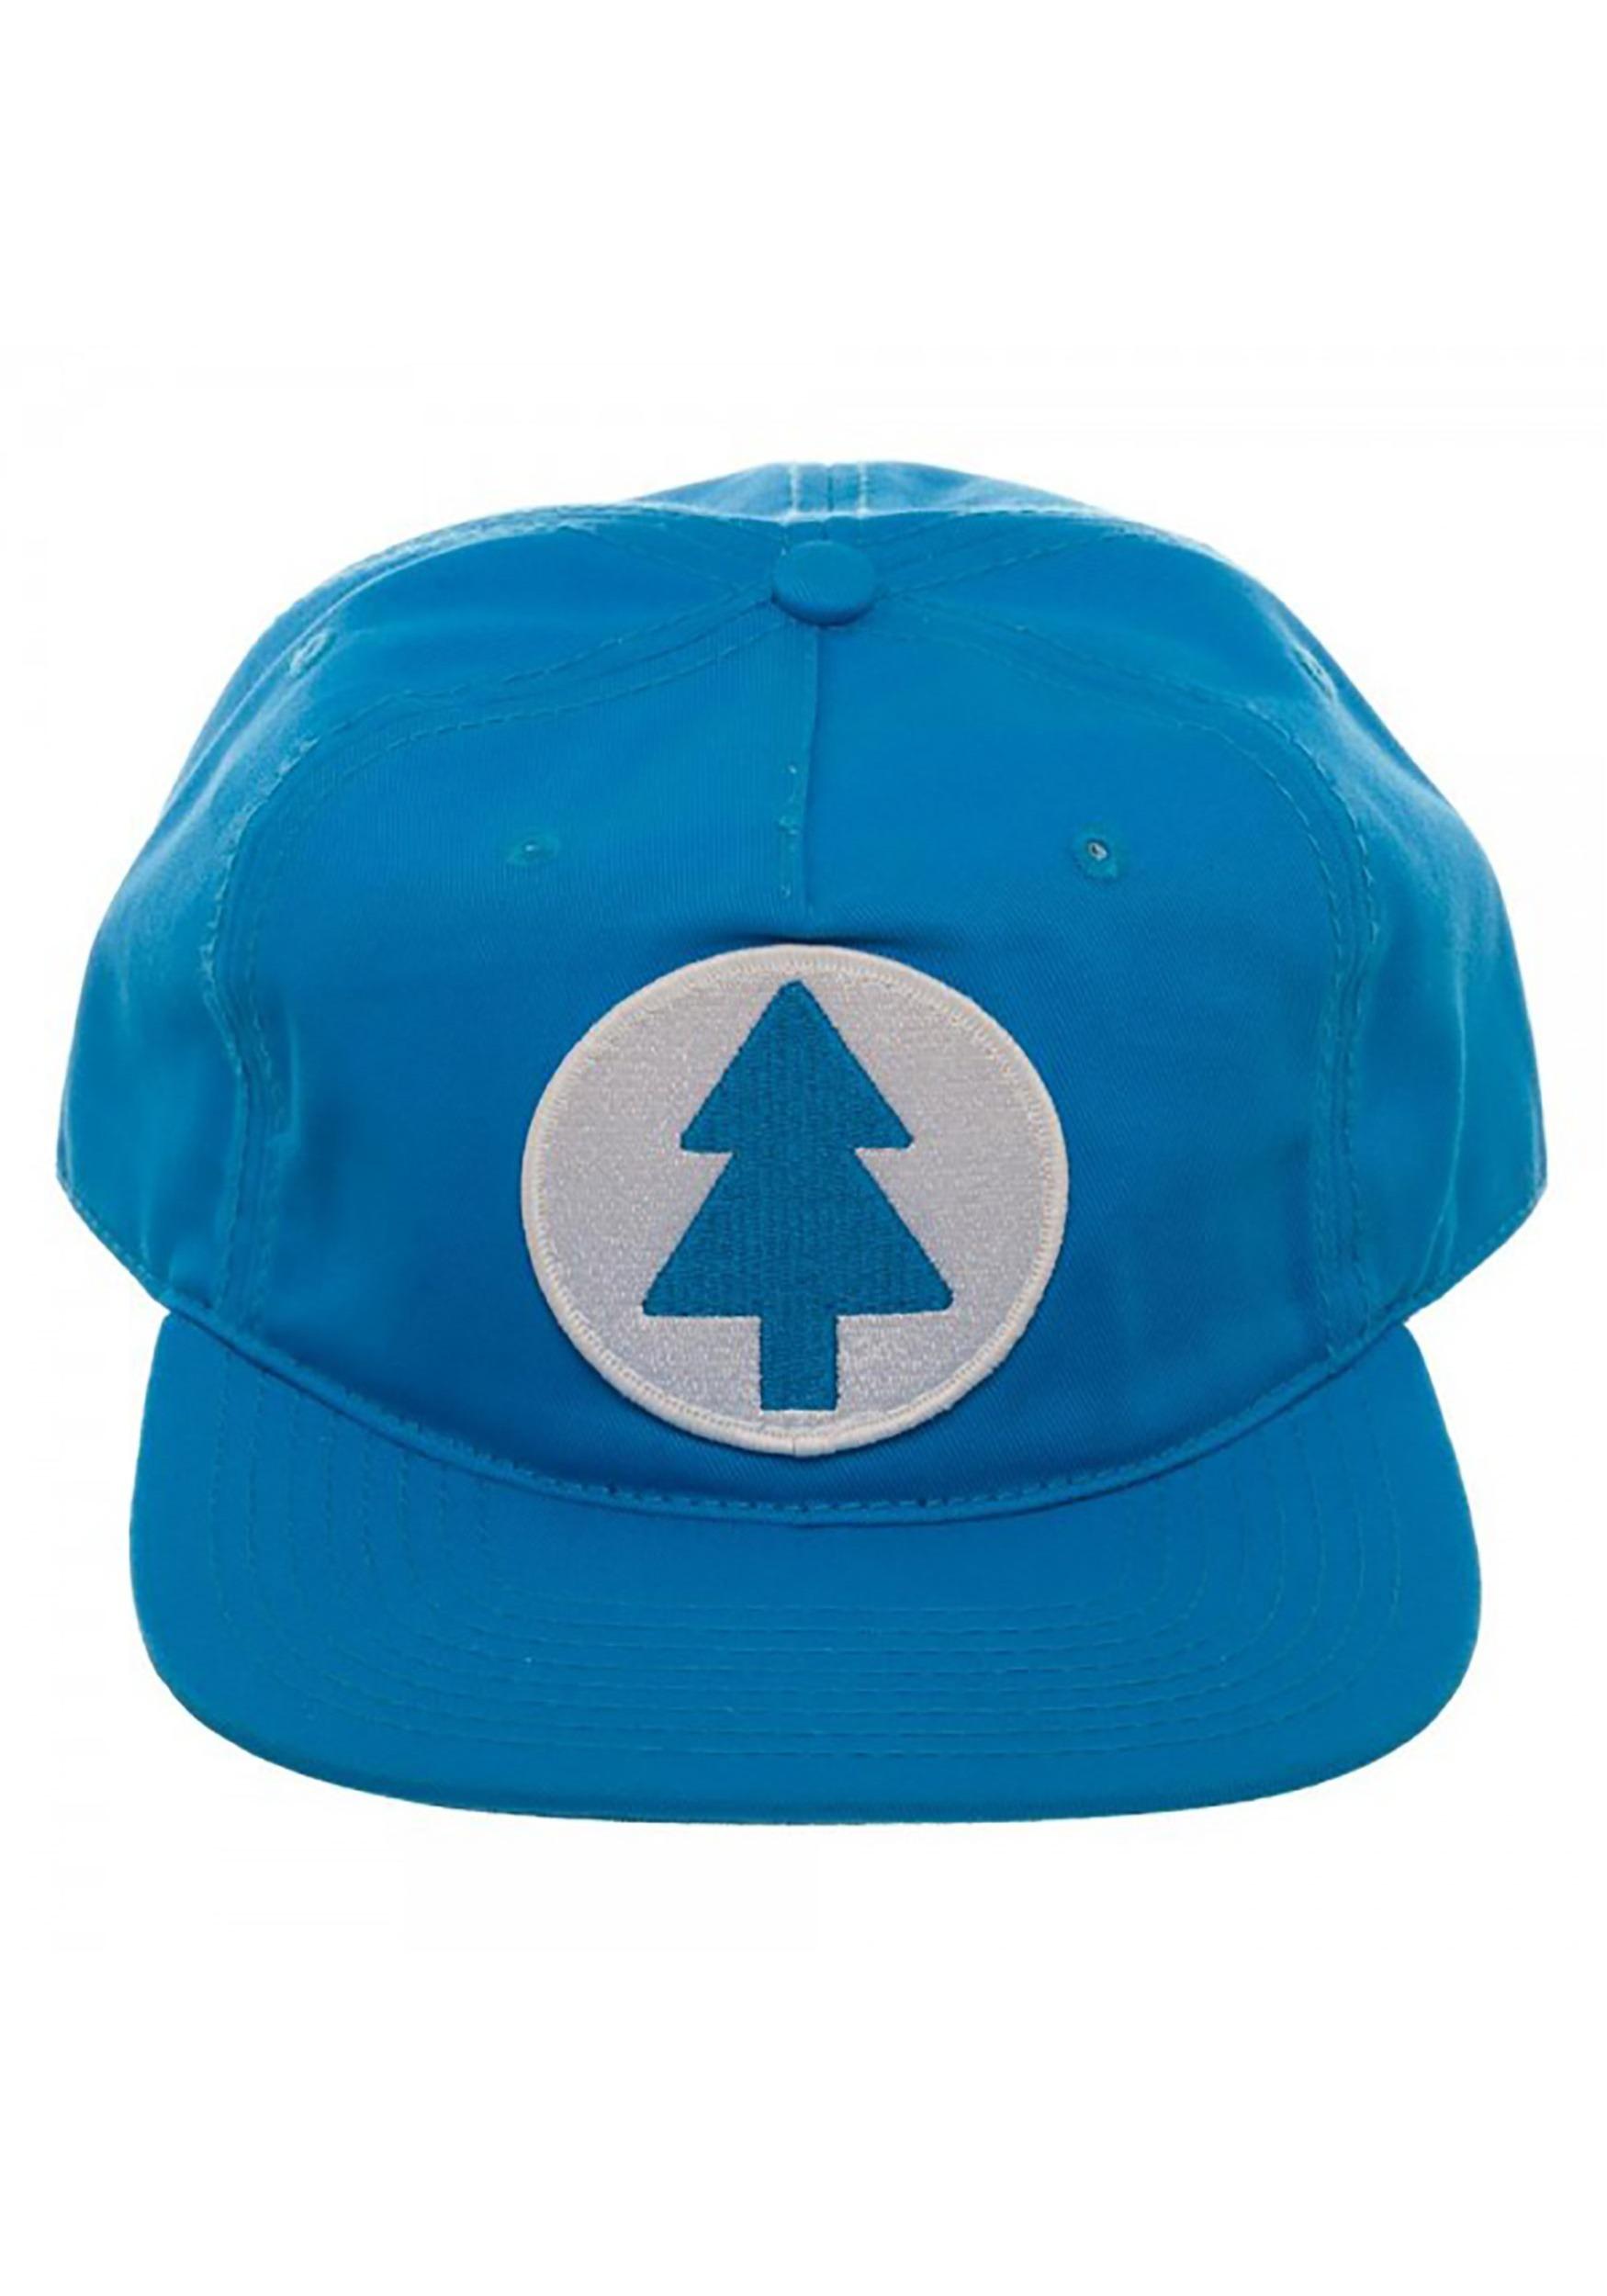 Gravity Falls Dipper Pines Snapback Cap